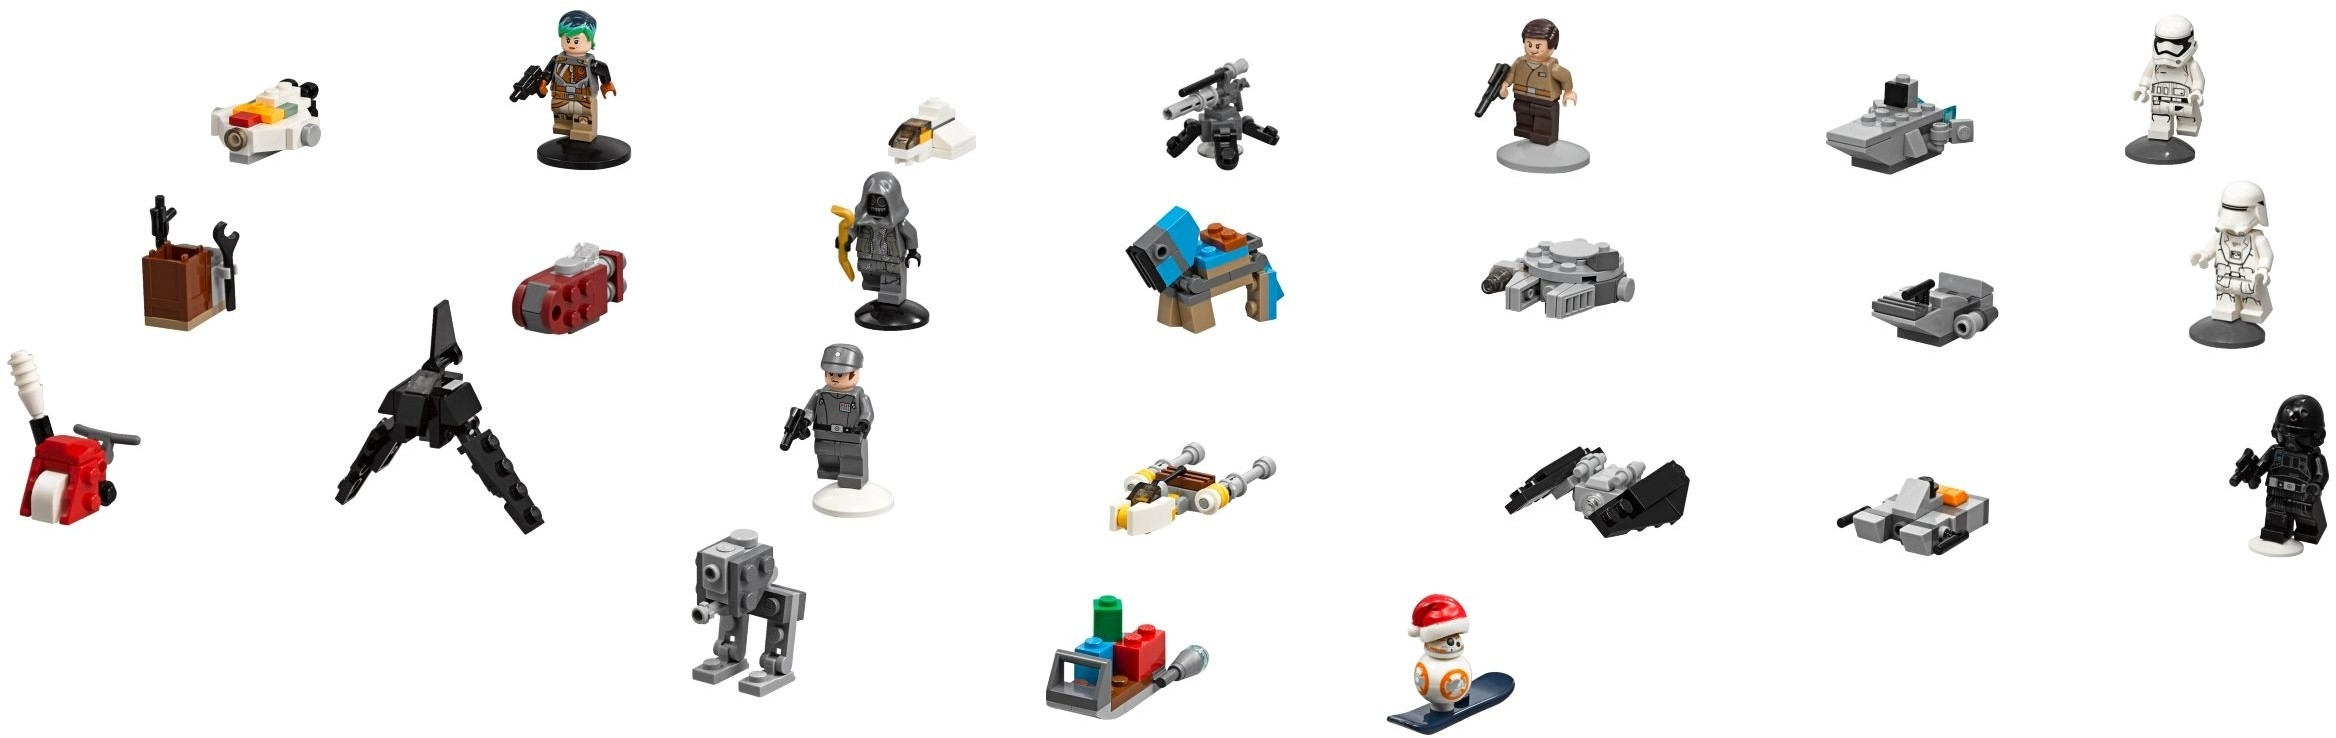 Lego Star Wars Advent Calendar Instructions 75184, Star Wars regarding Lego Star Wars Instructions Advent Calendar